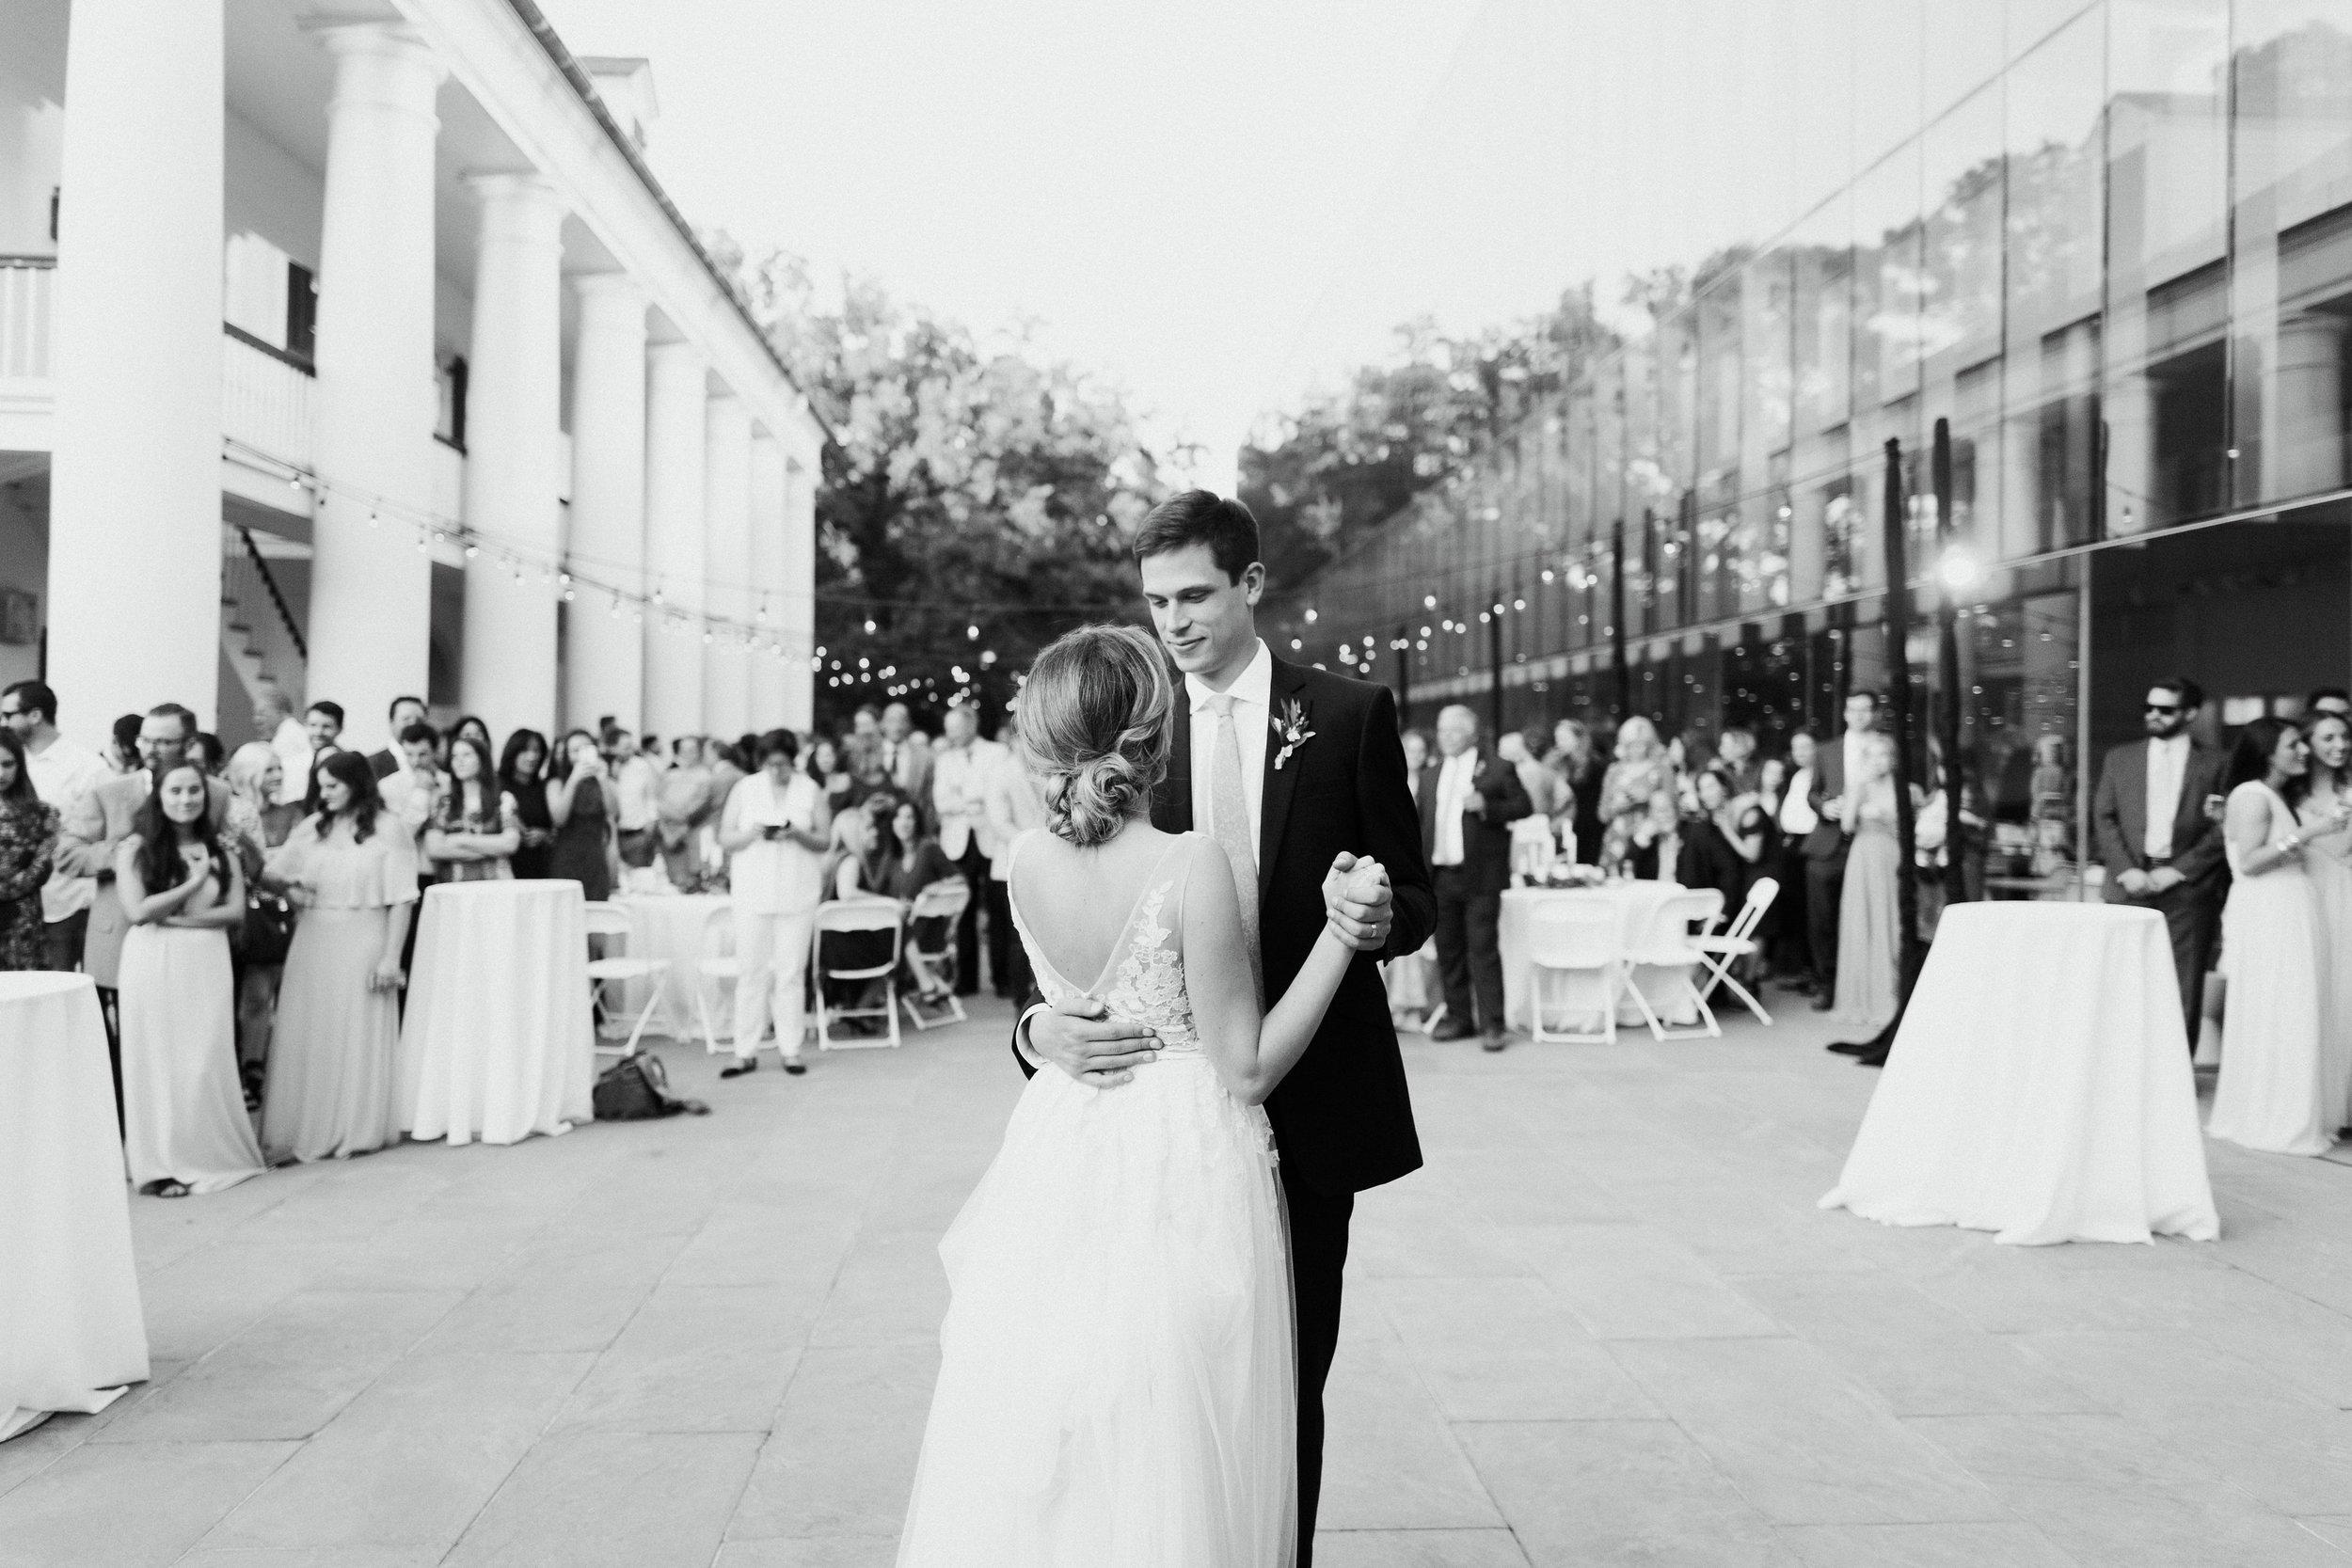 Southern Fete, Southern Wedding, Bride and Groom, First Dance, Carolynn Seibert Photography, Paul and Lulu Hilliard Art Museum